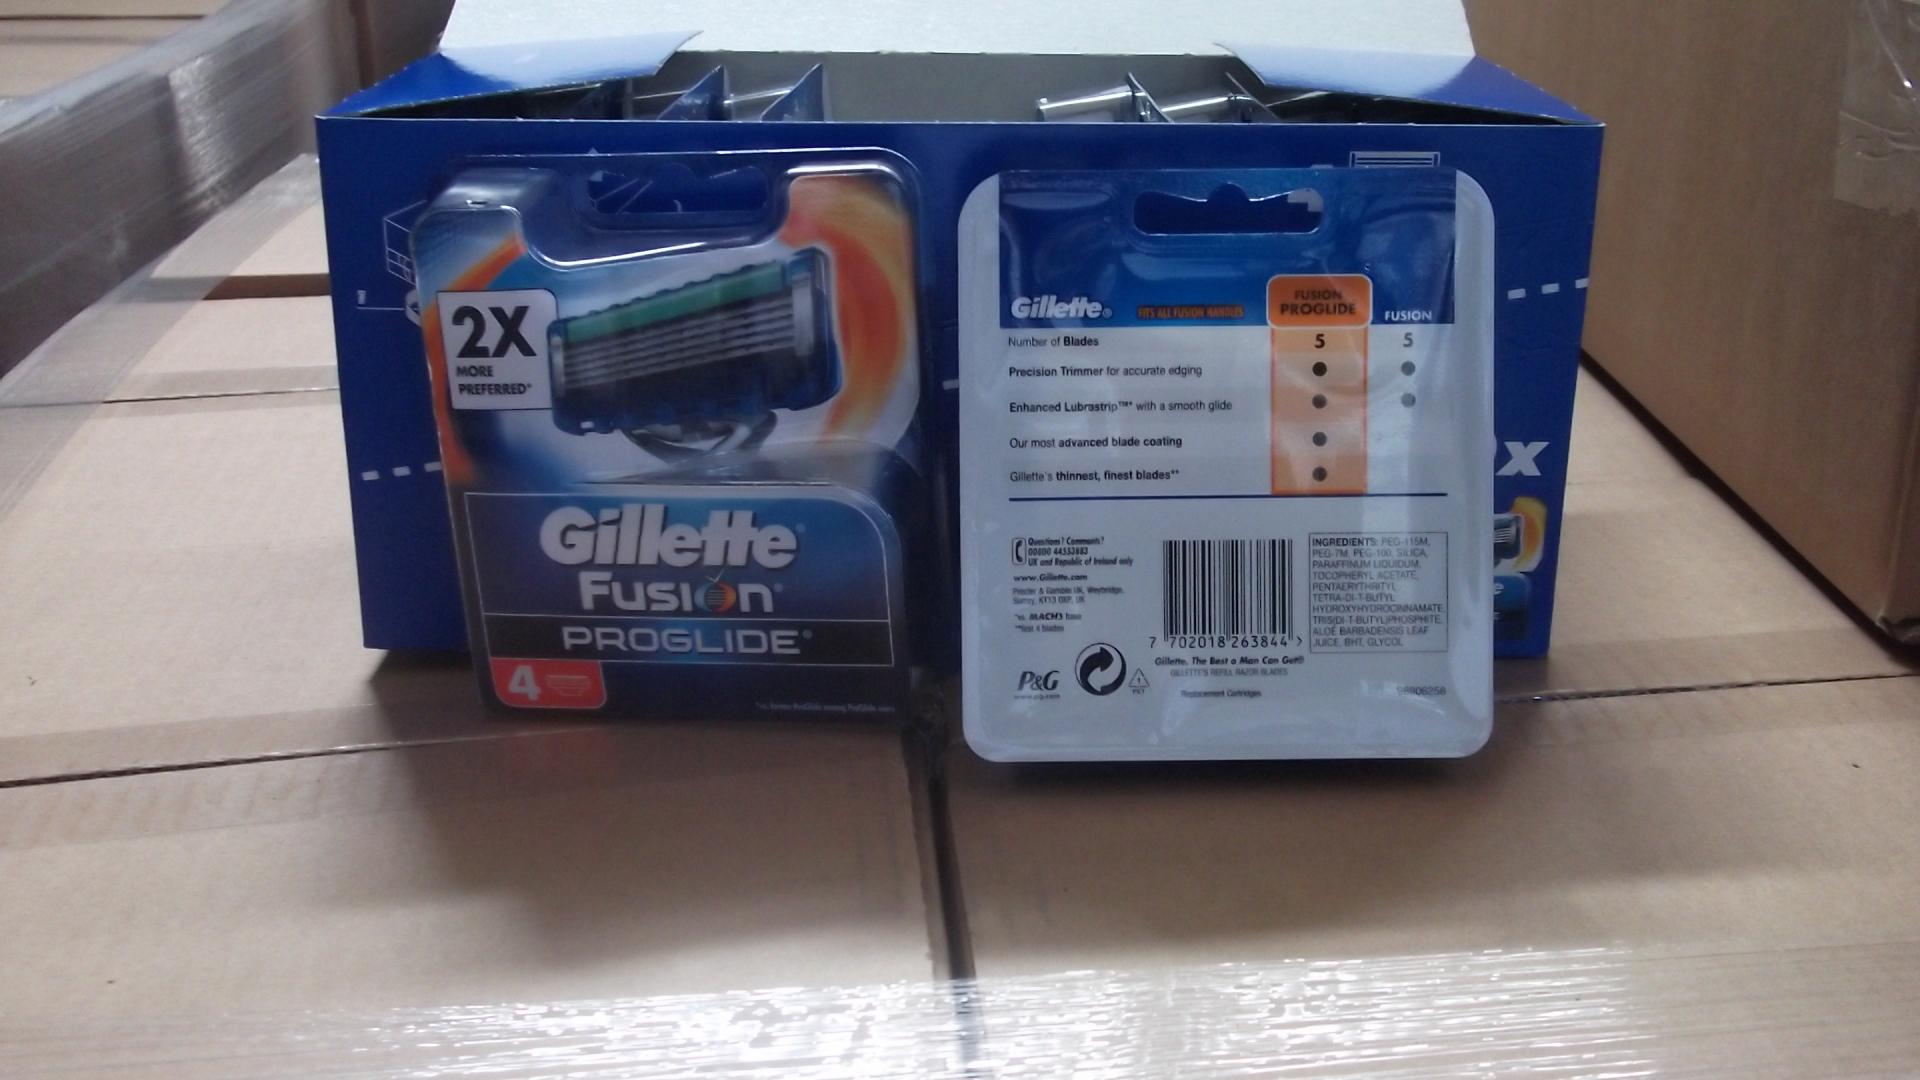 Gillette Old Spice Head Shoulder Pantene Crest Oral B Duracell Fusion Proglide Manual Razor Tmr Power Blades 4s 8s Baldes